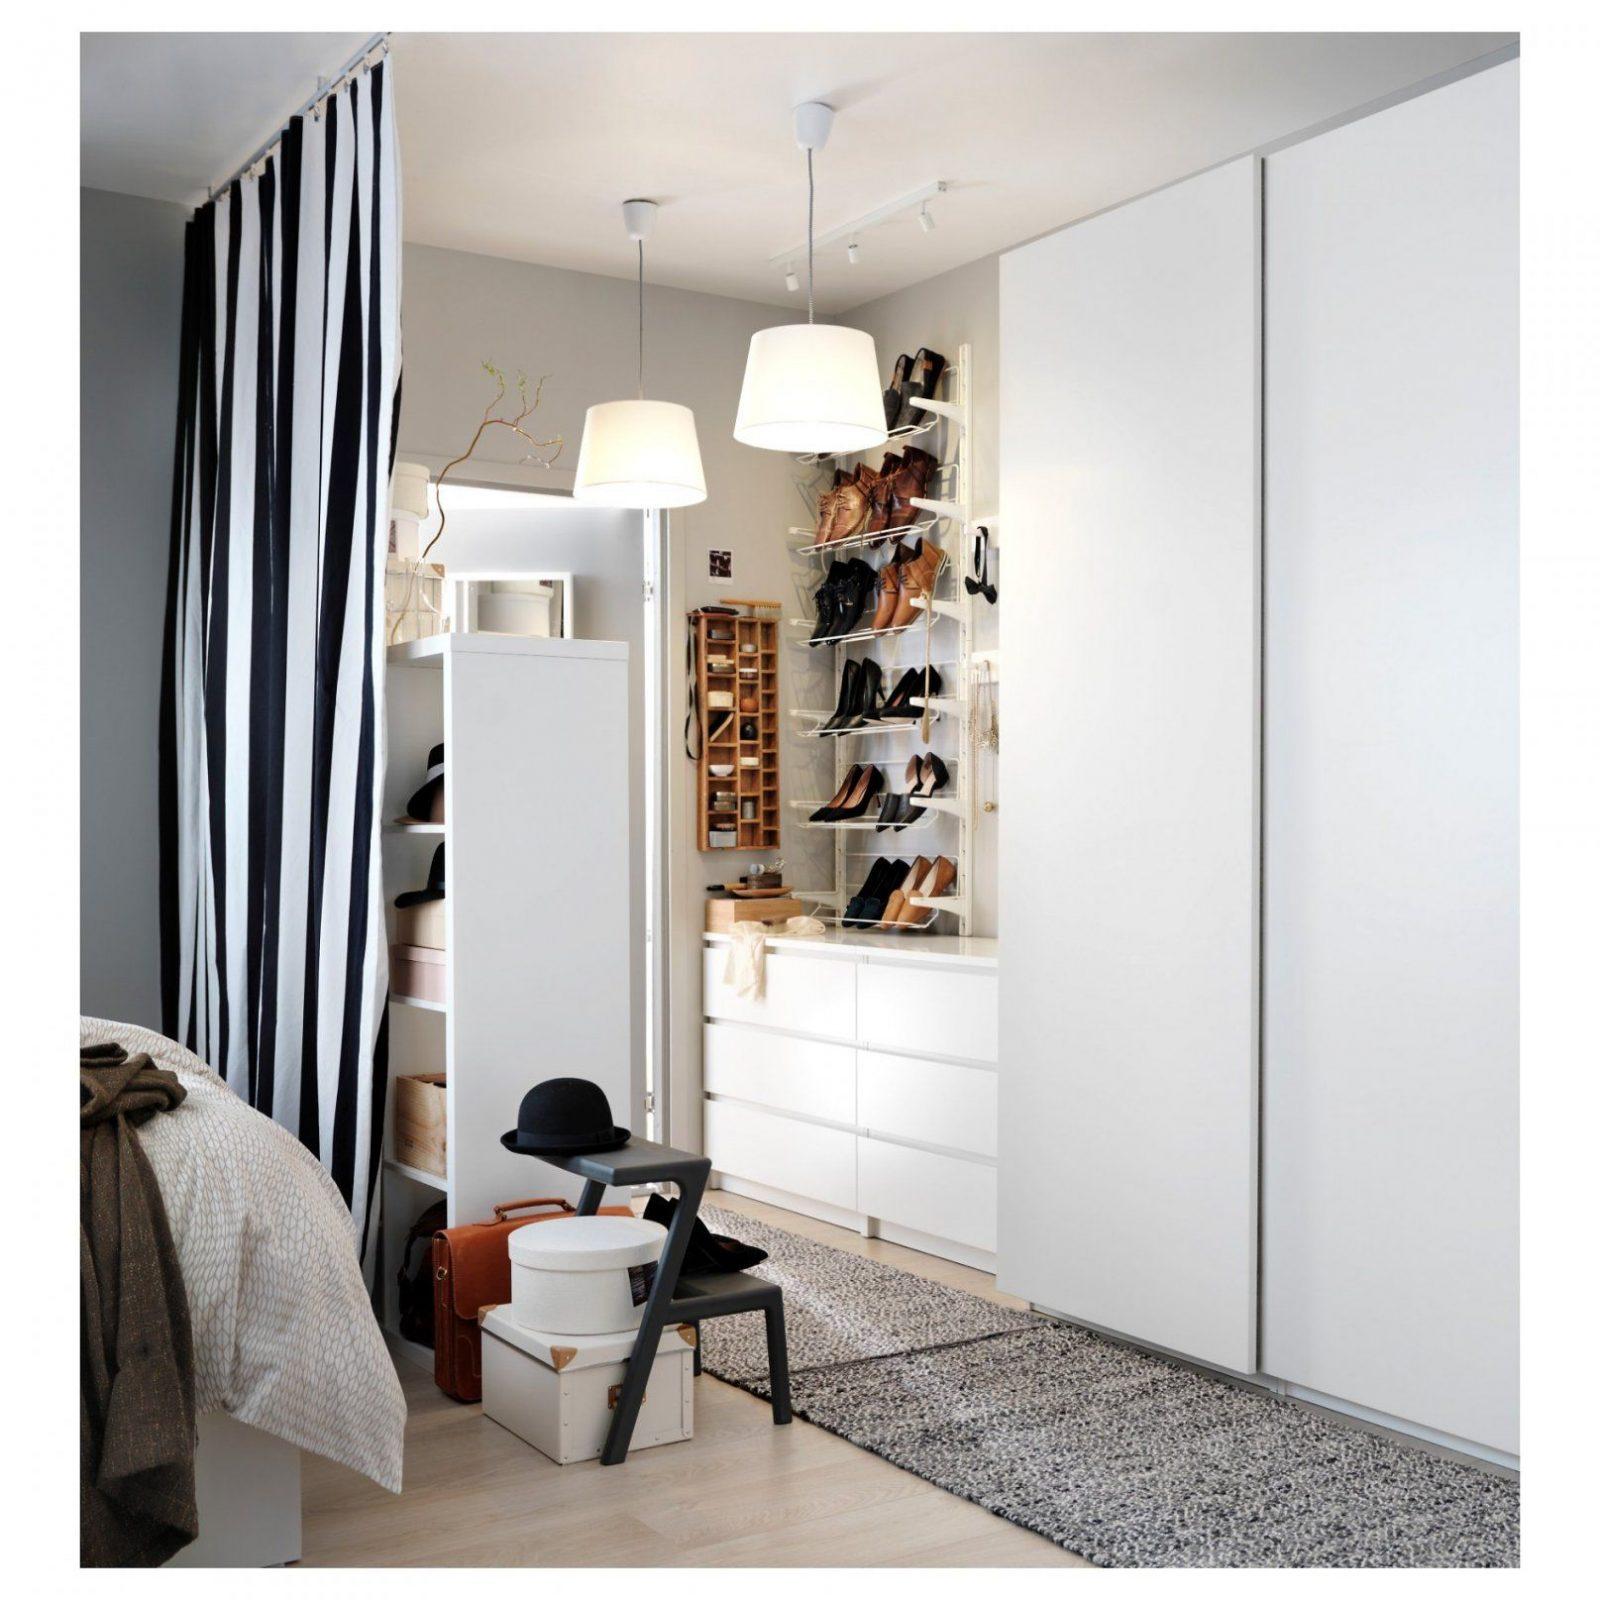 Perfekt Begehbarer Kleiderschrank Ikea Planen Für Begehbarer von Ikea Begehbarer Kleiderschrank Planen Bild